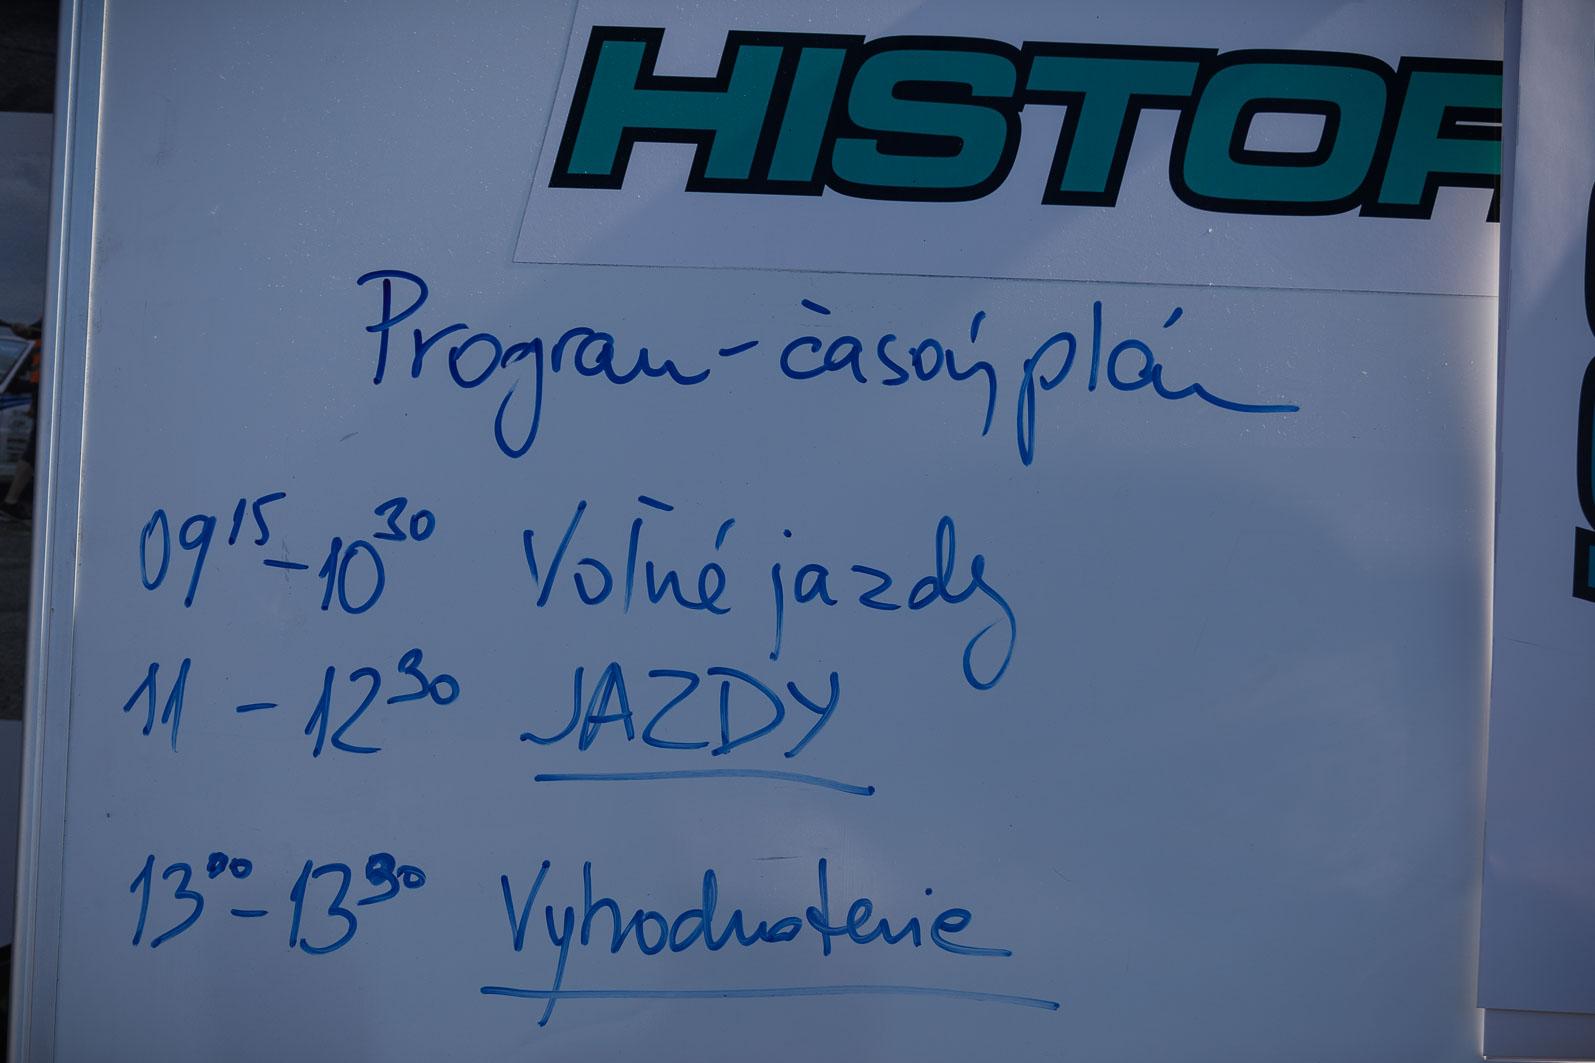 Pieštany-4677